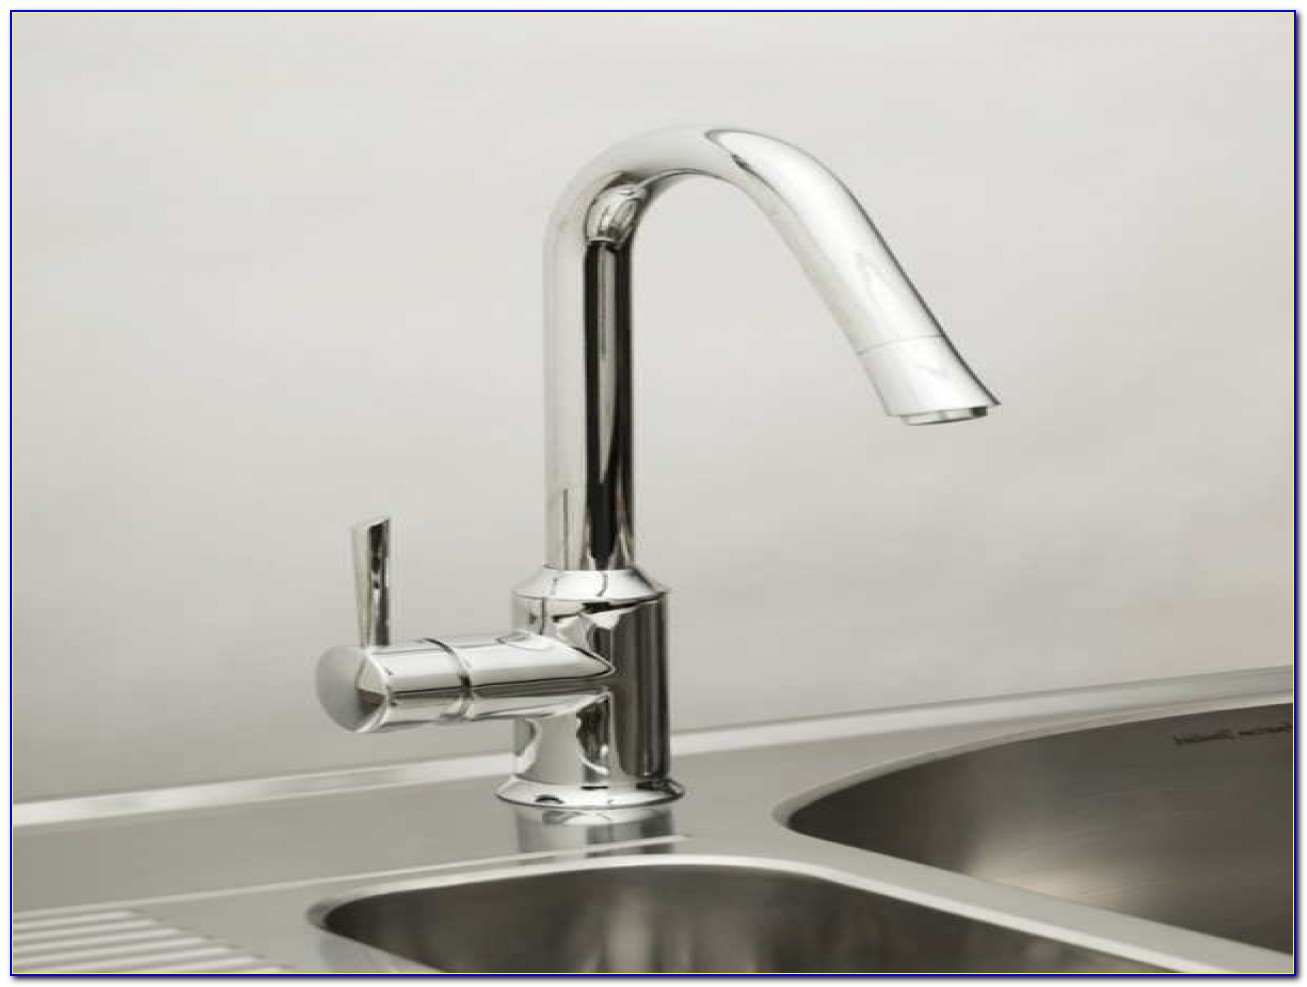 American Standard Cadet Faucet 8125